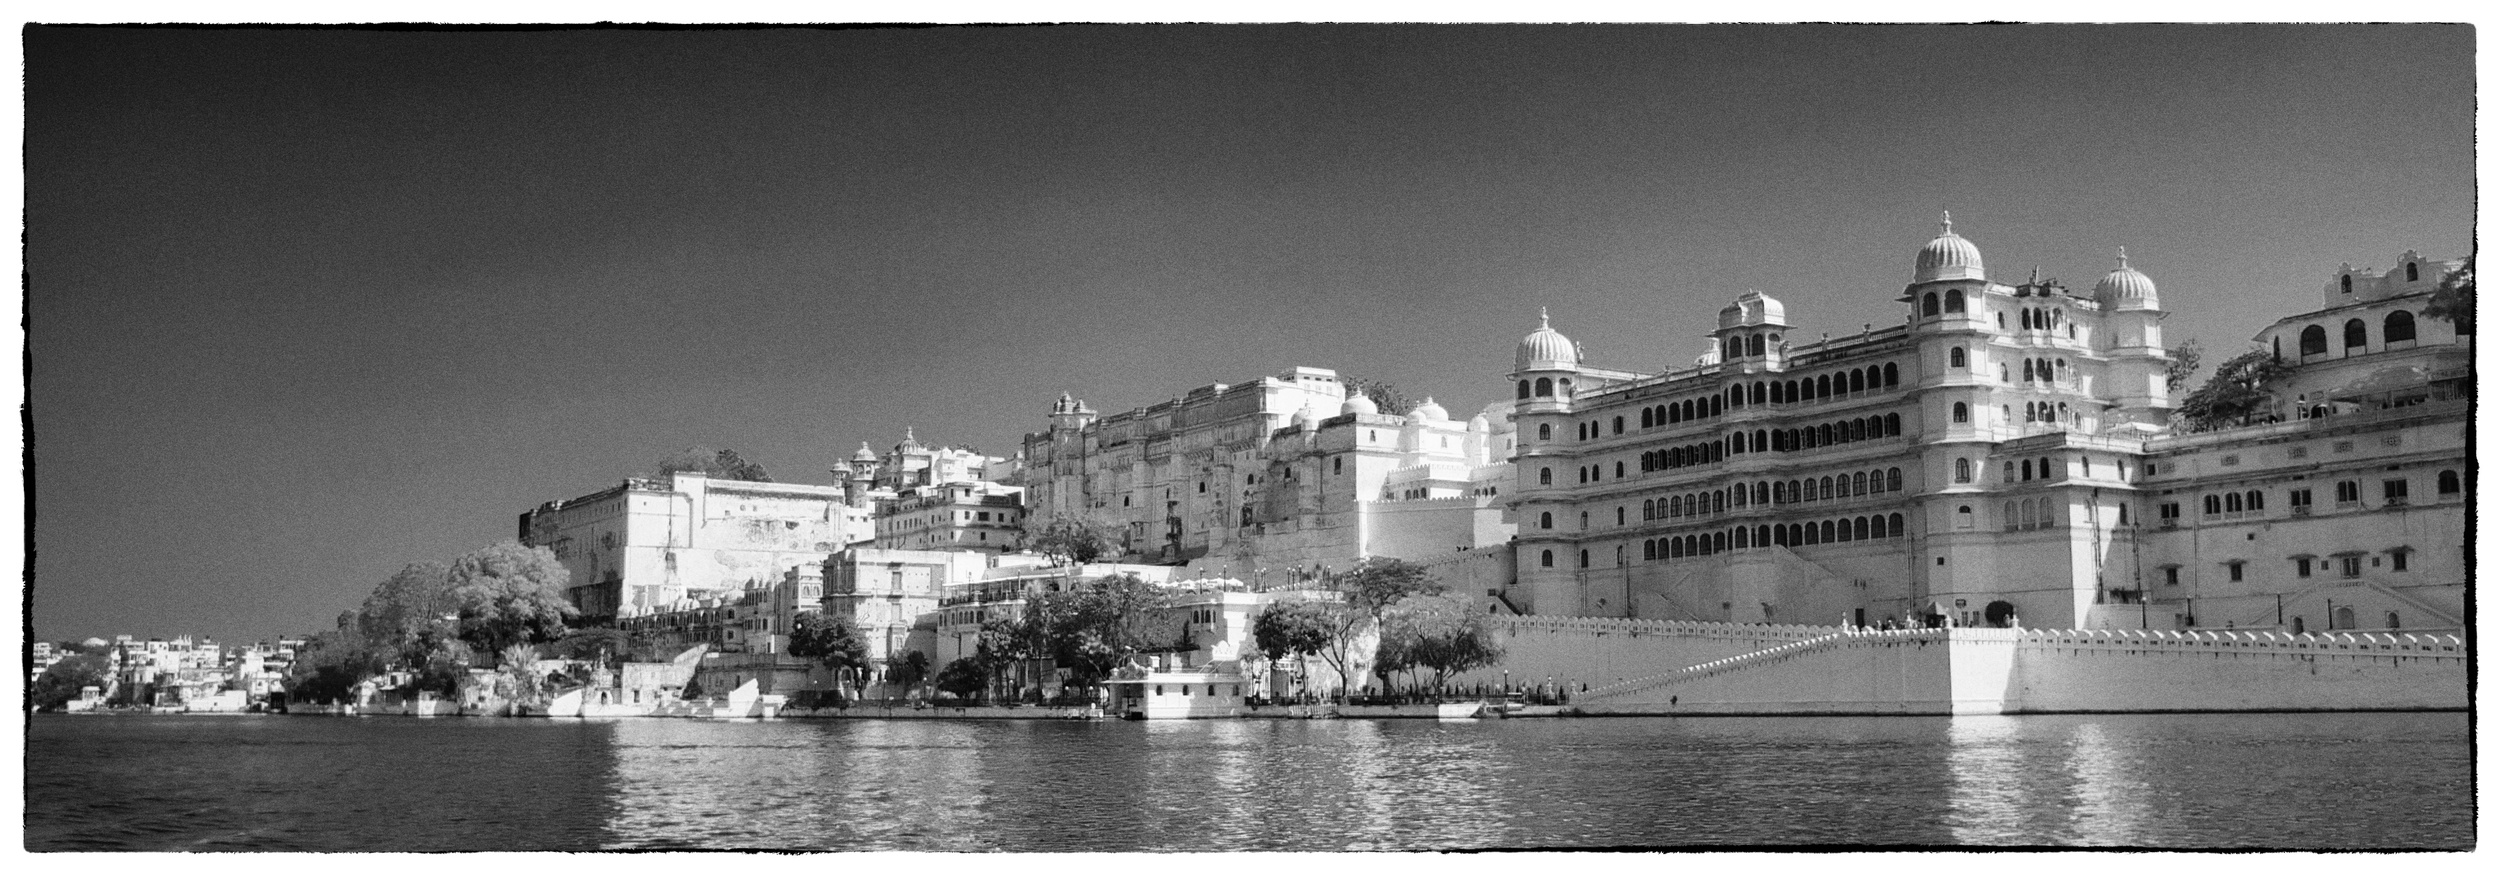 City Palace, Udaipur (Nikon 1 V1, 10mm Nikkor)